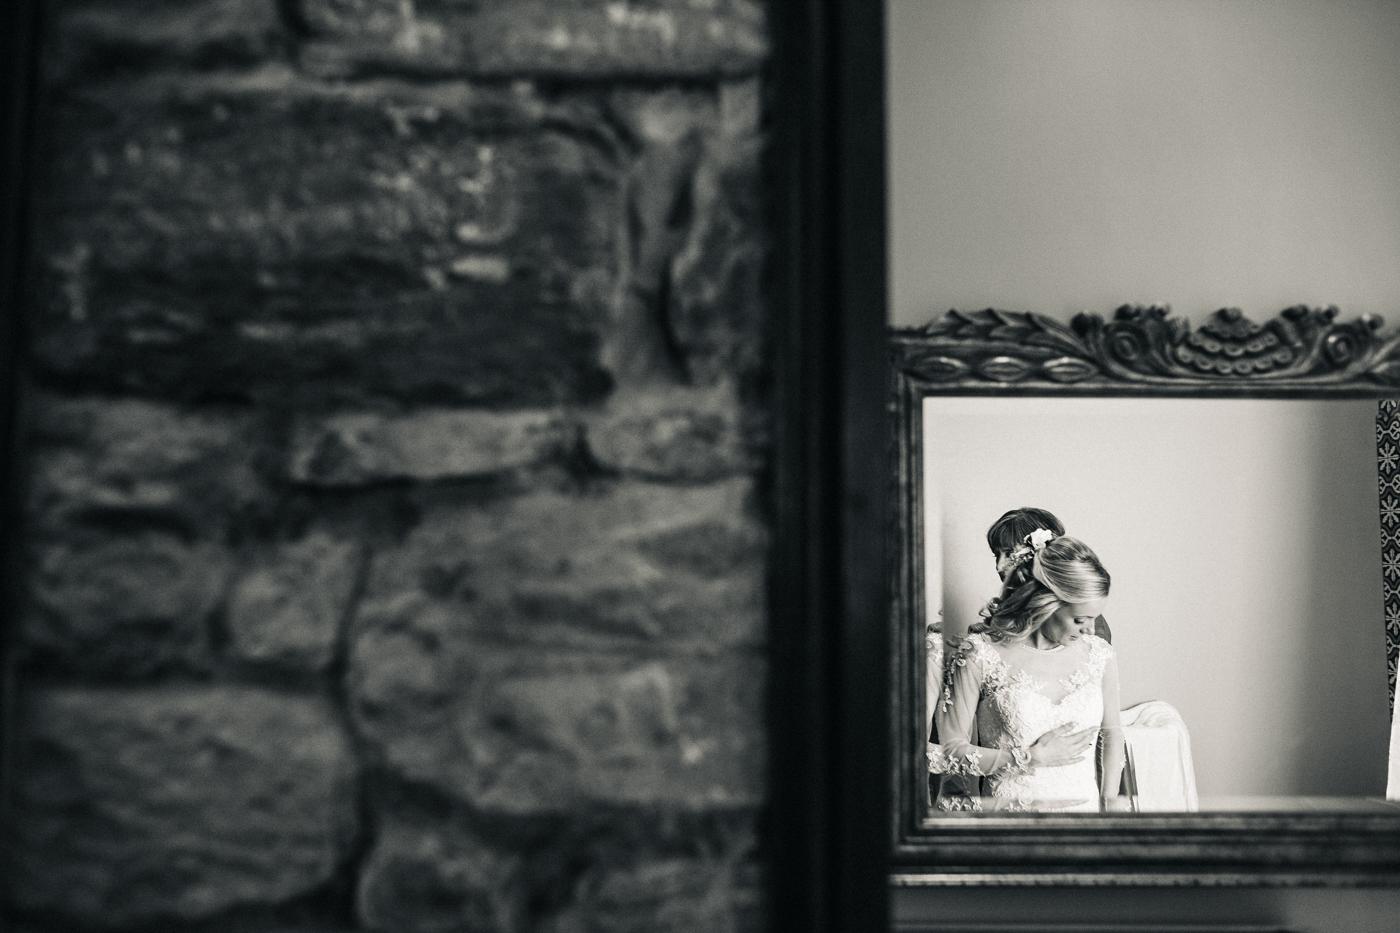 creative-wedding-photography-teesside-north-east-yorkshire-42.jpg